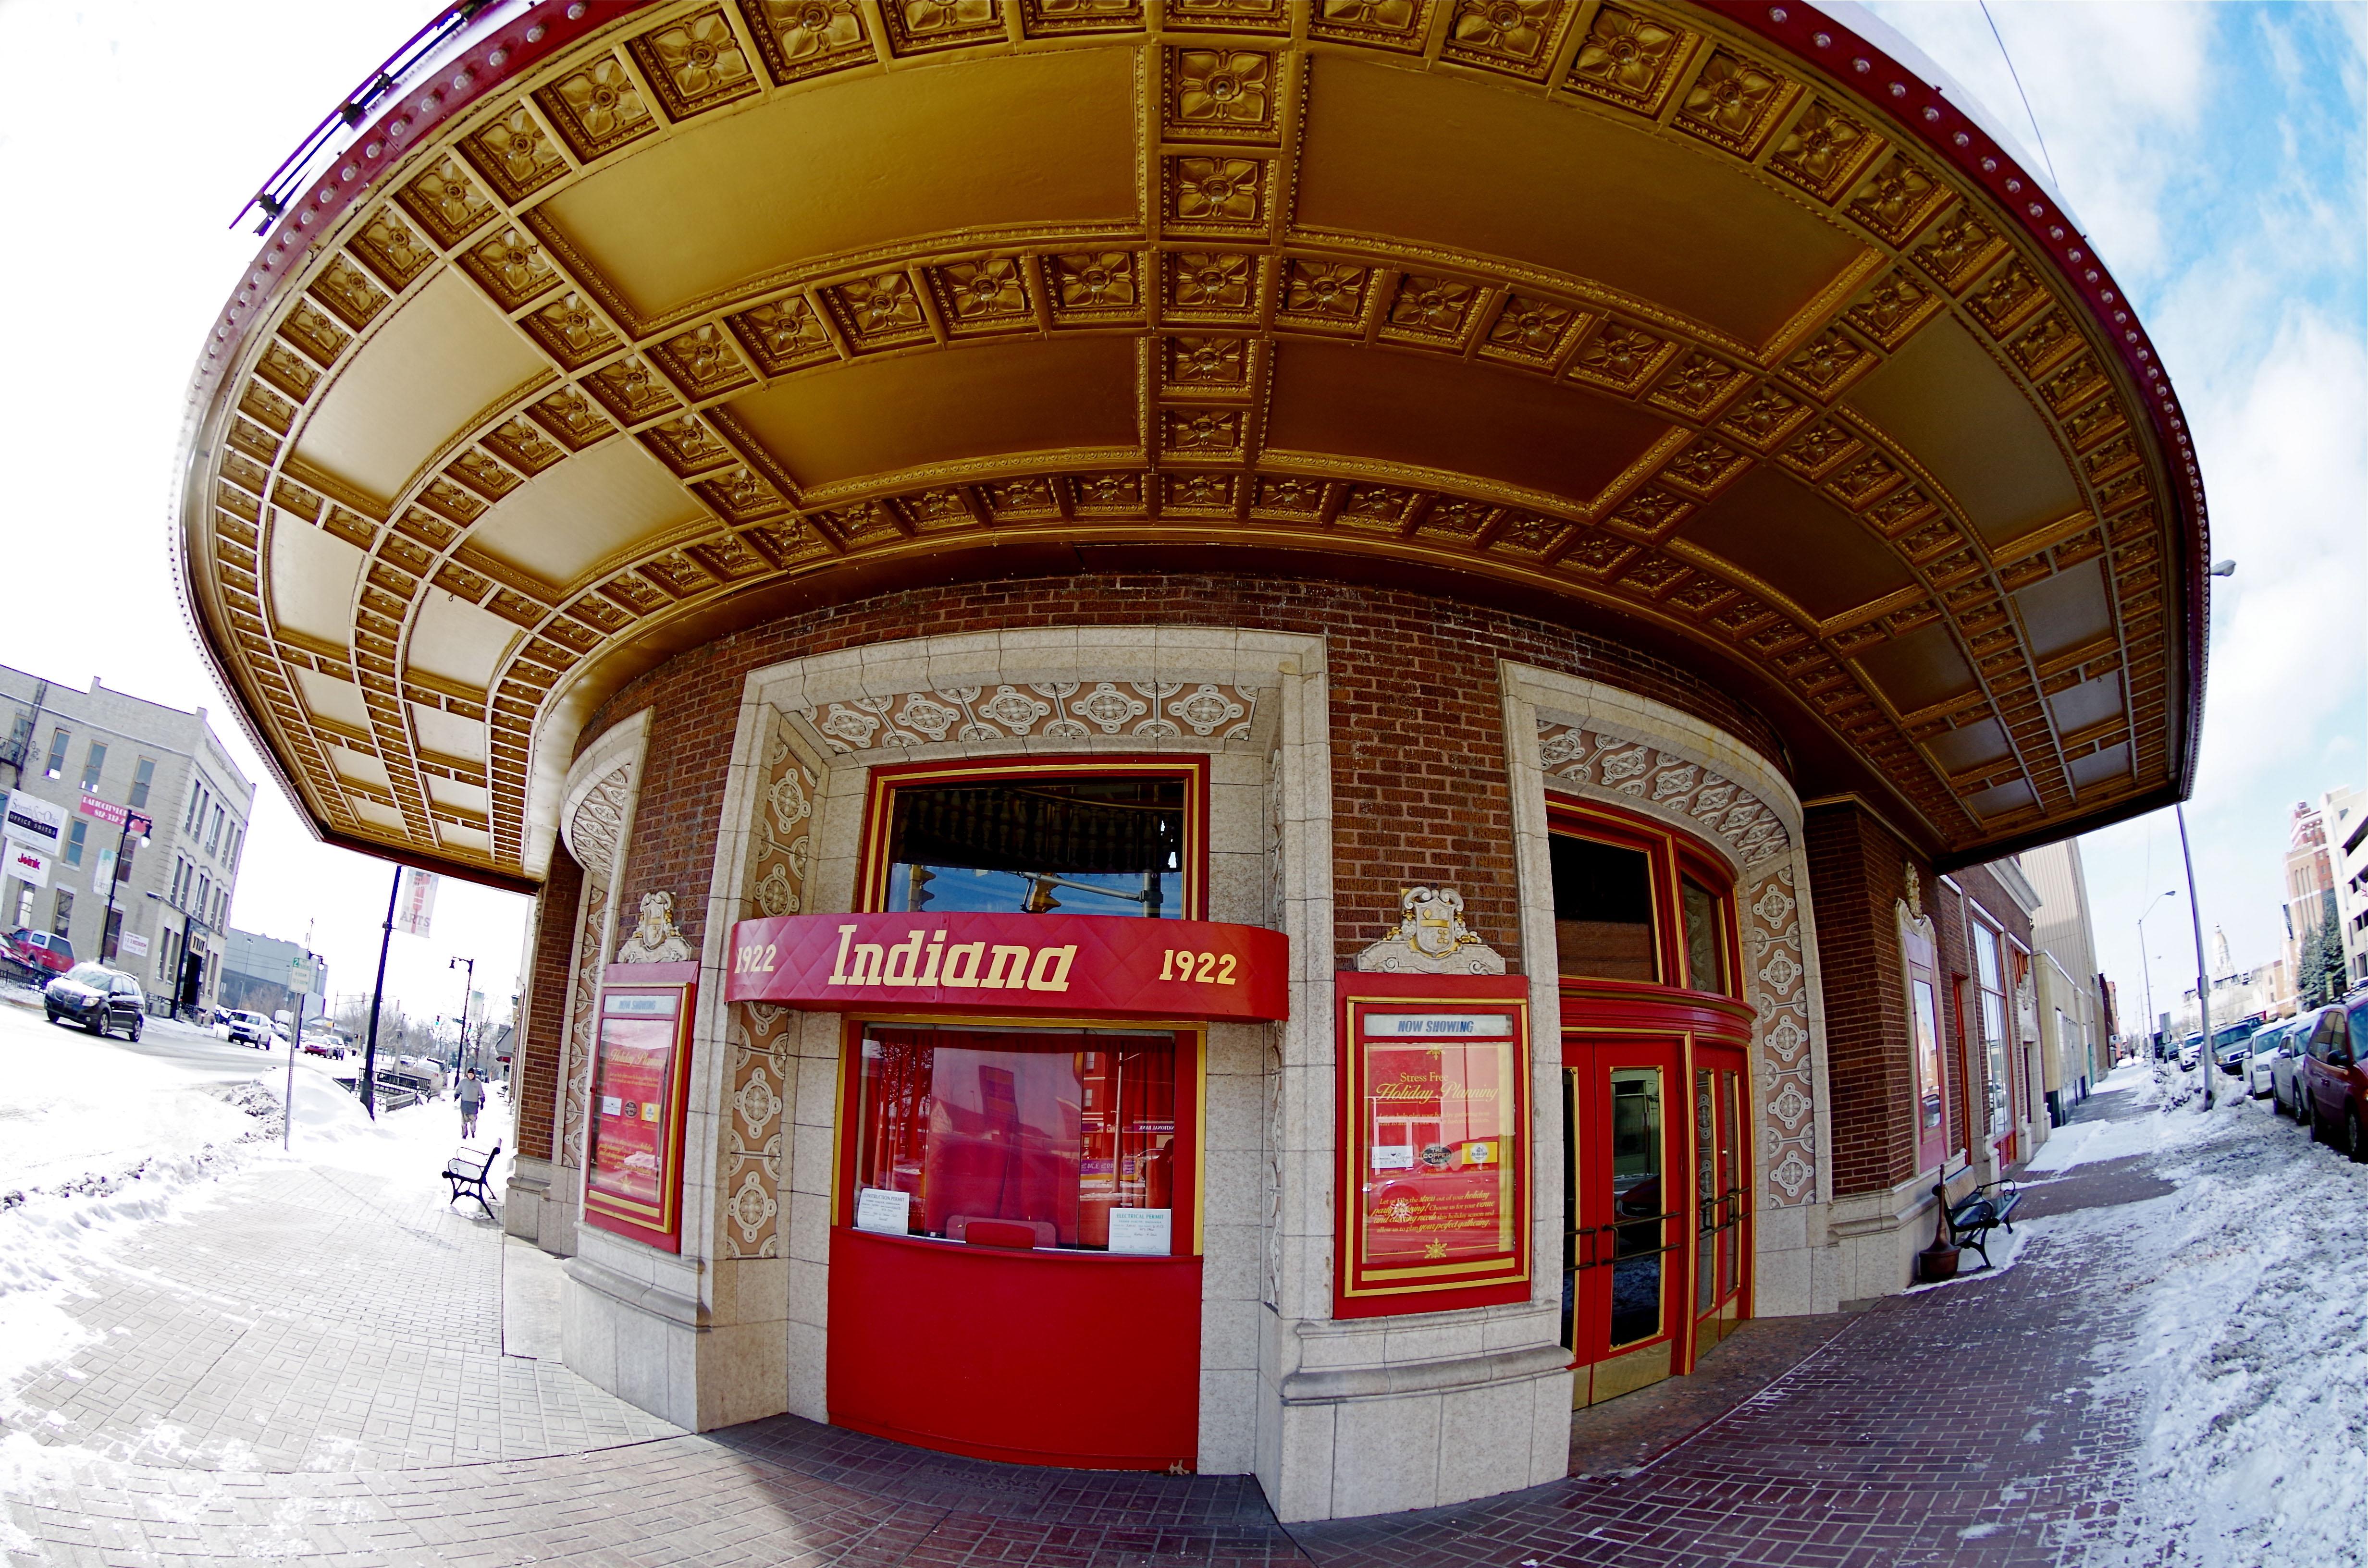 1922 Indiana Theatre